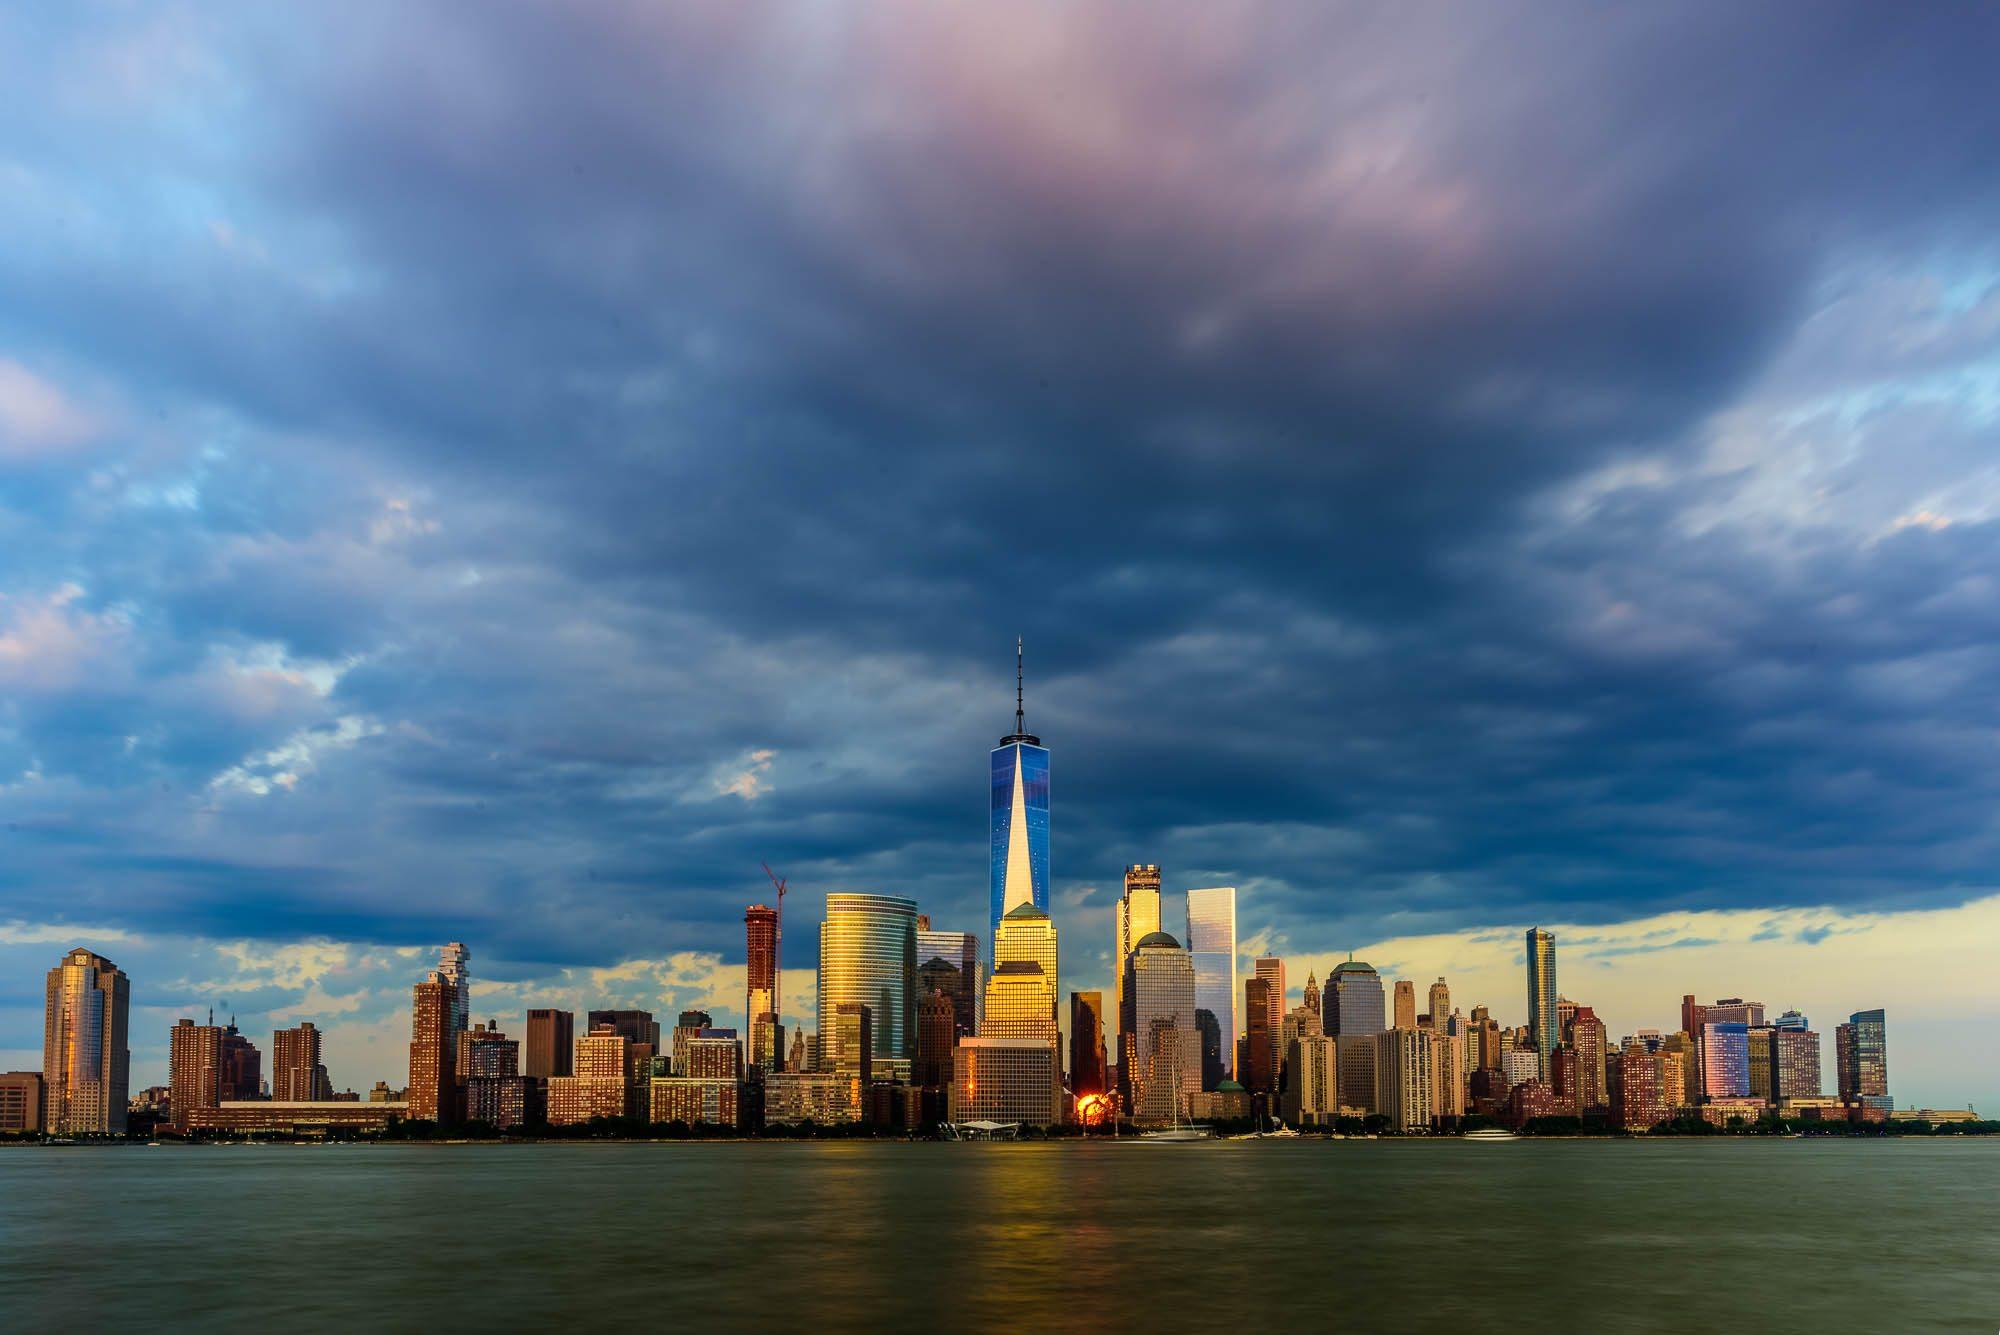 Storm sky over NYC